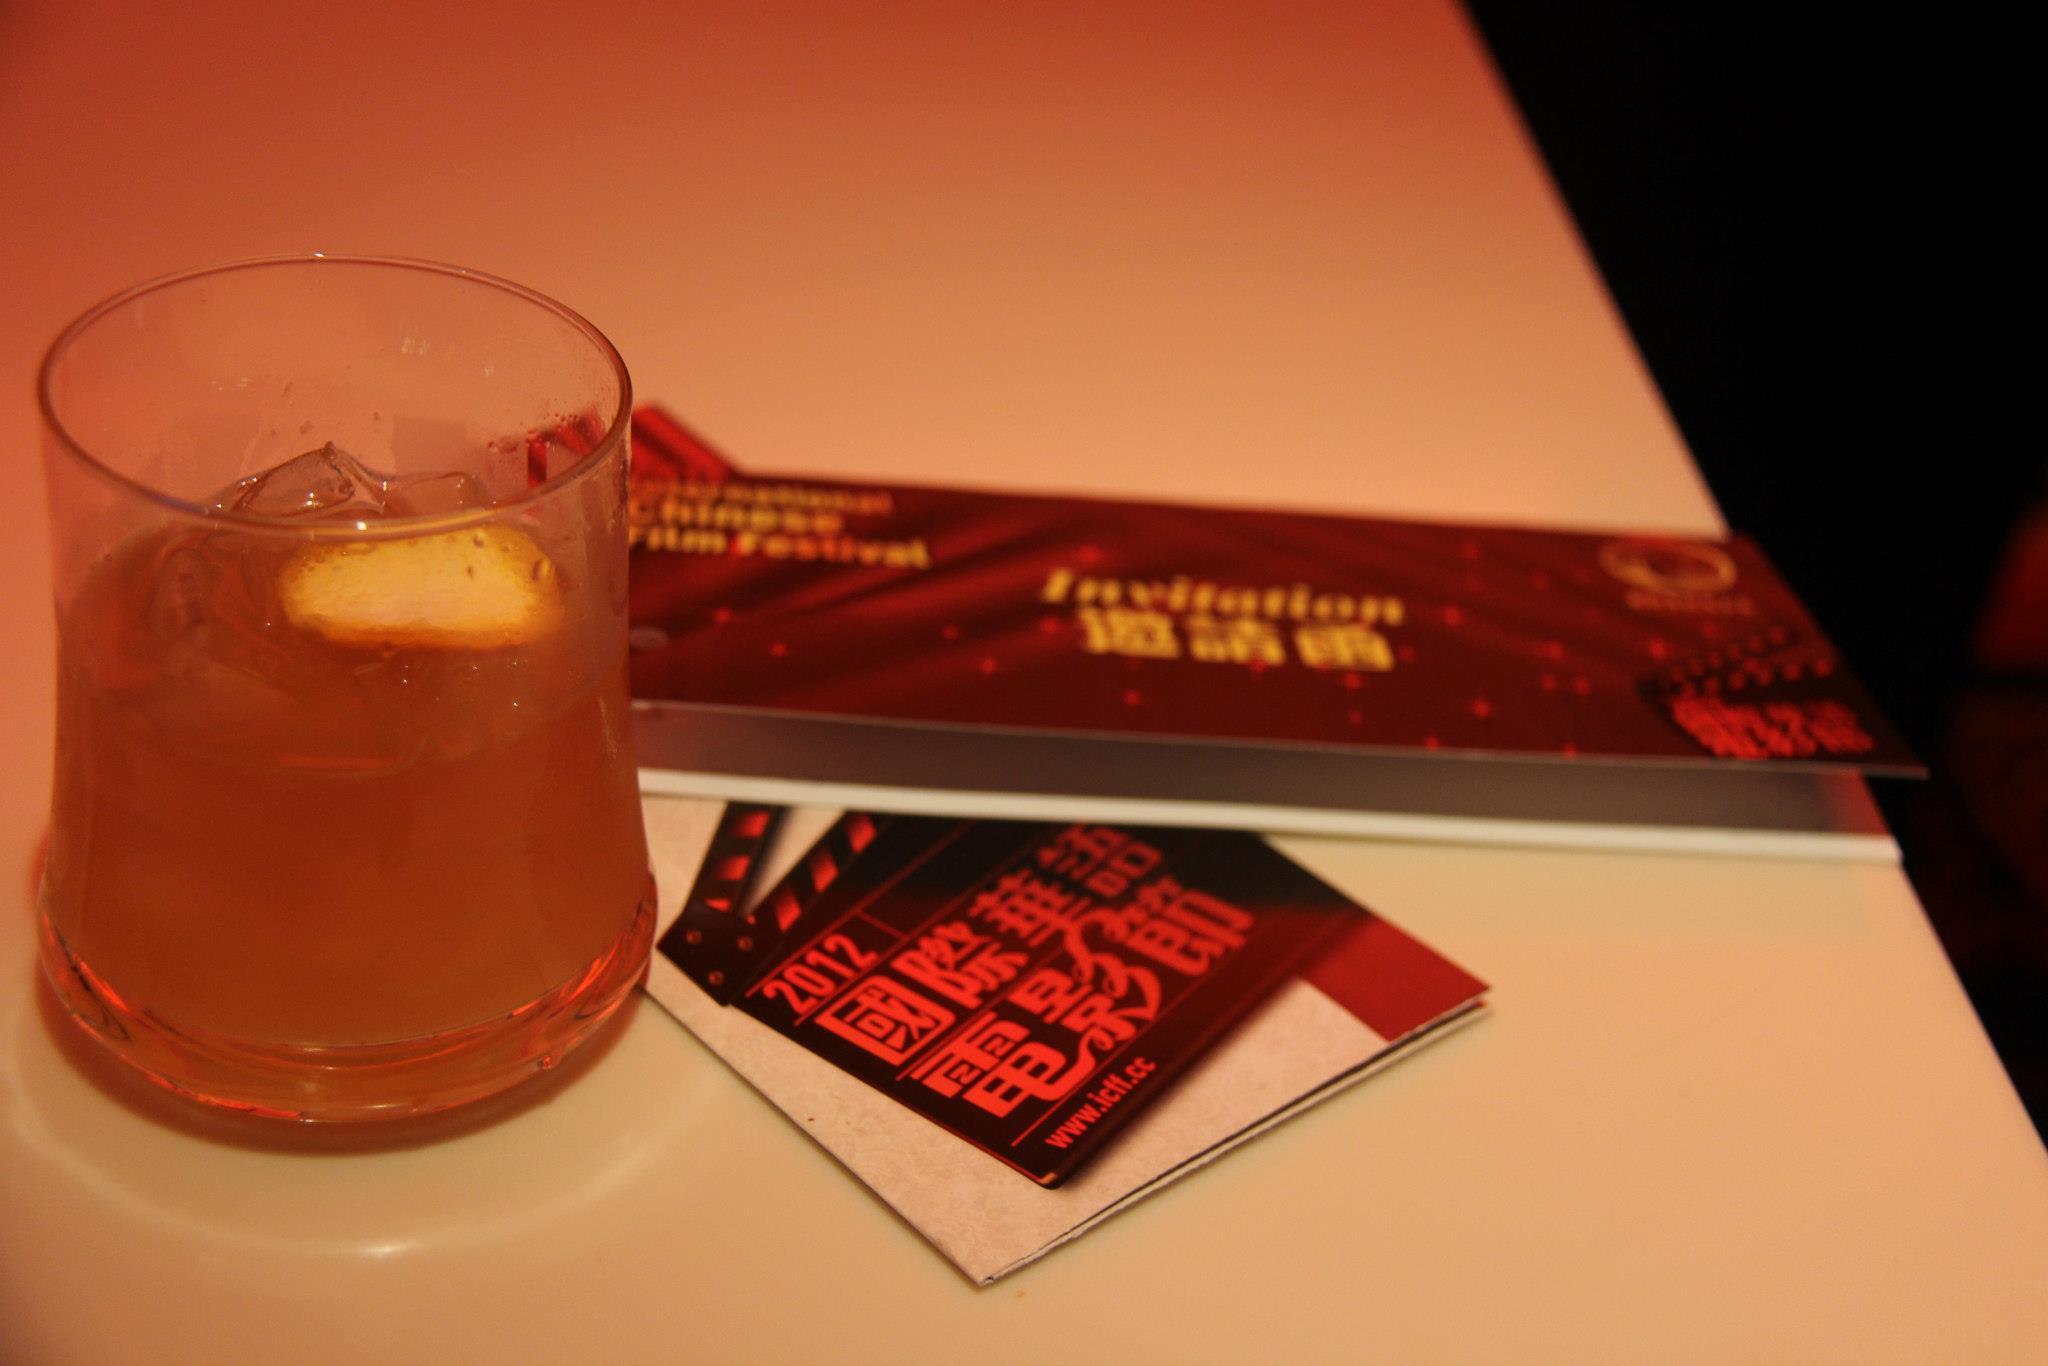 International Chinese Film Festival 2012 - Sydney - (Reviews / Media Coverage)